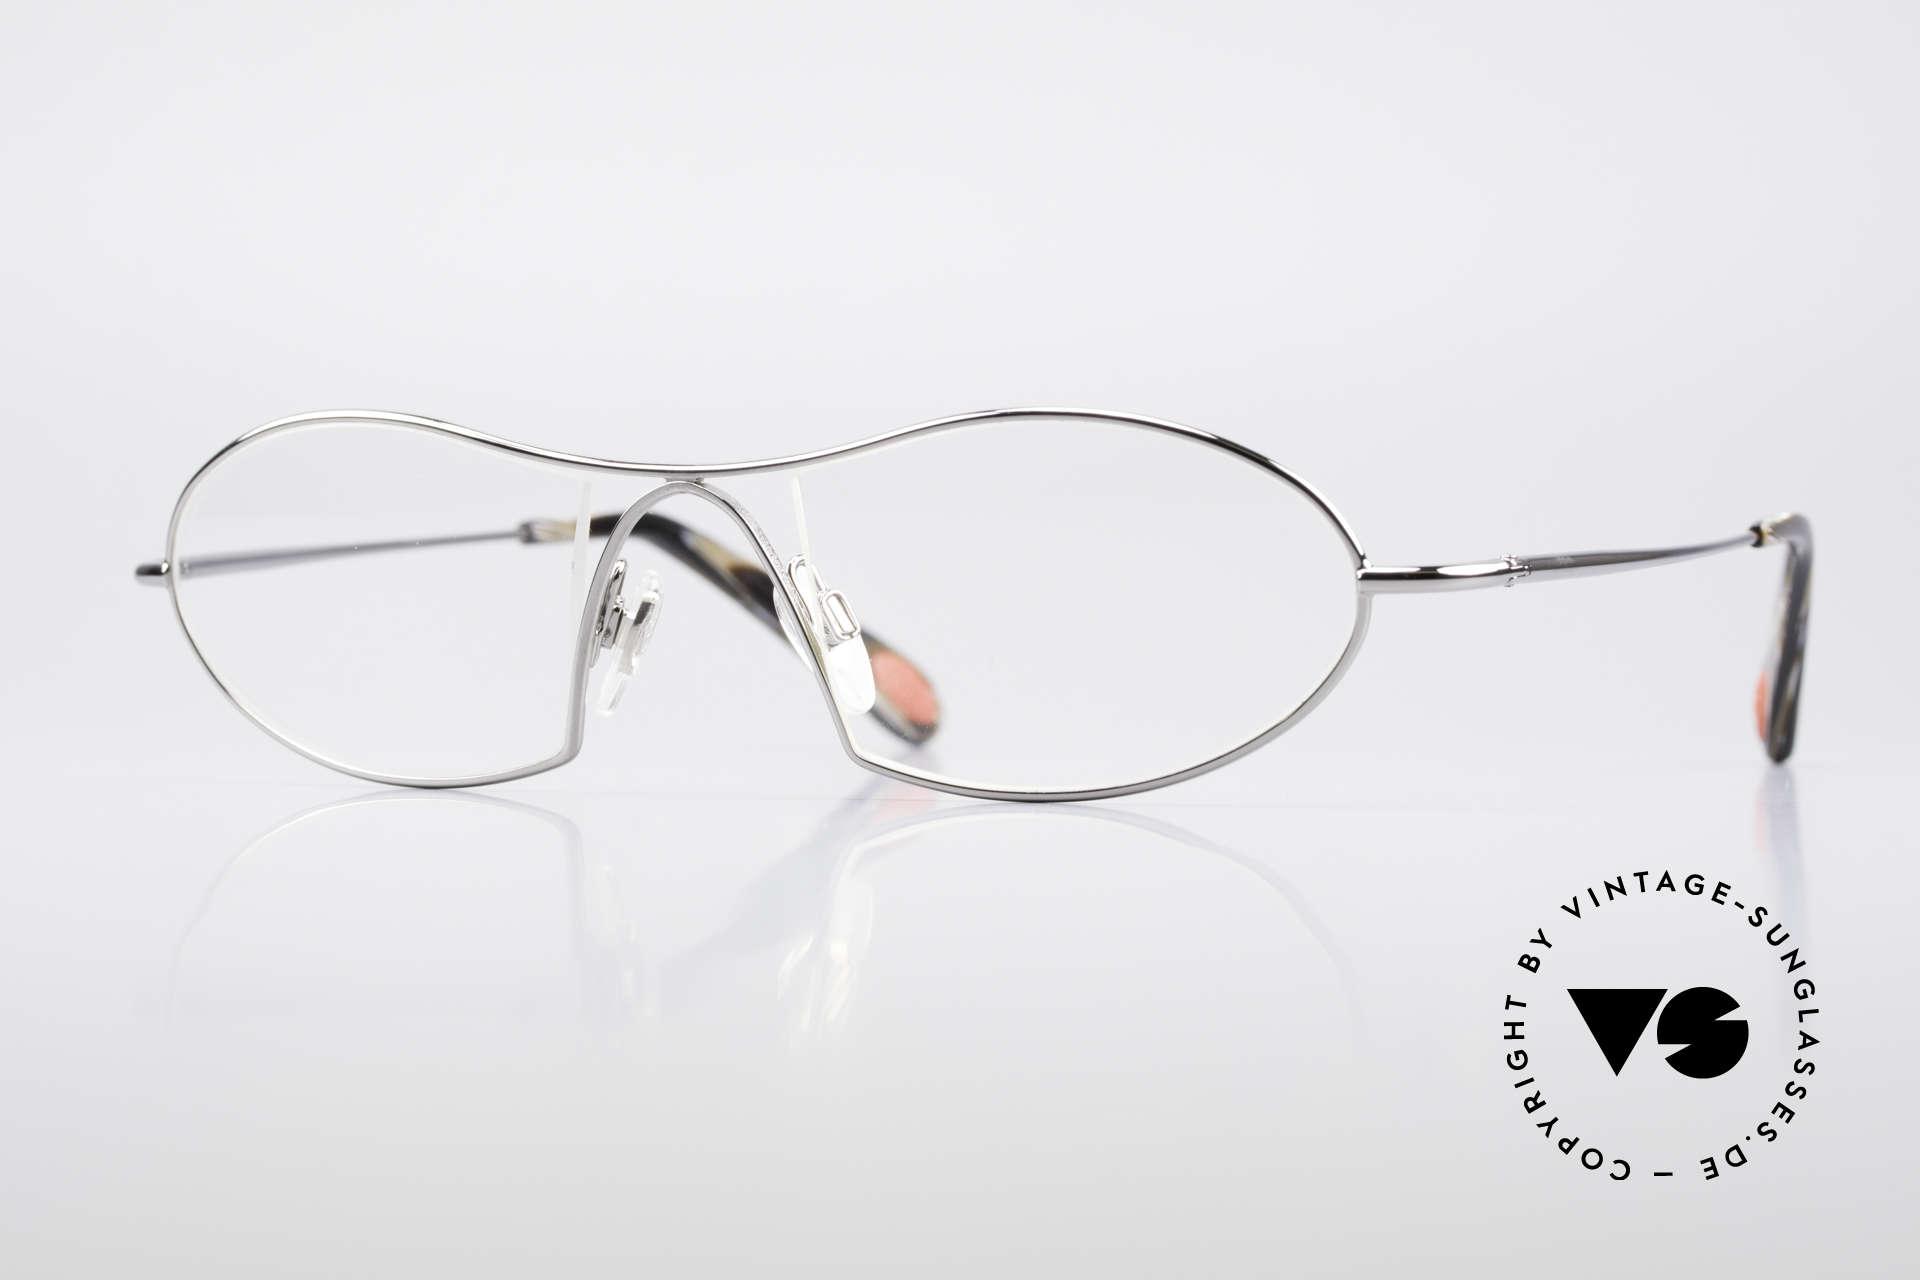 Bugatti 345 Odotype Men's Designer Vintage Frame, original BUGATTI high-tech eyeglass-frame, Made for Men